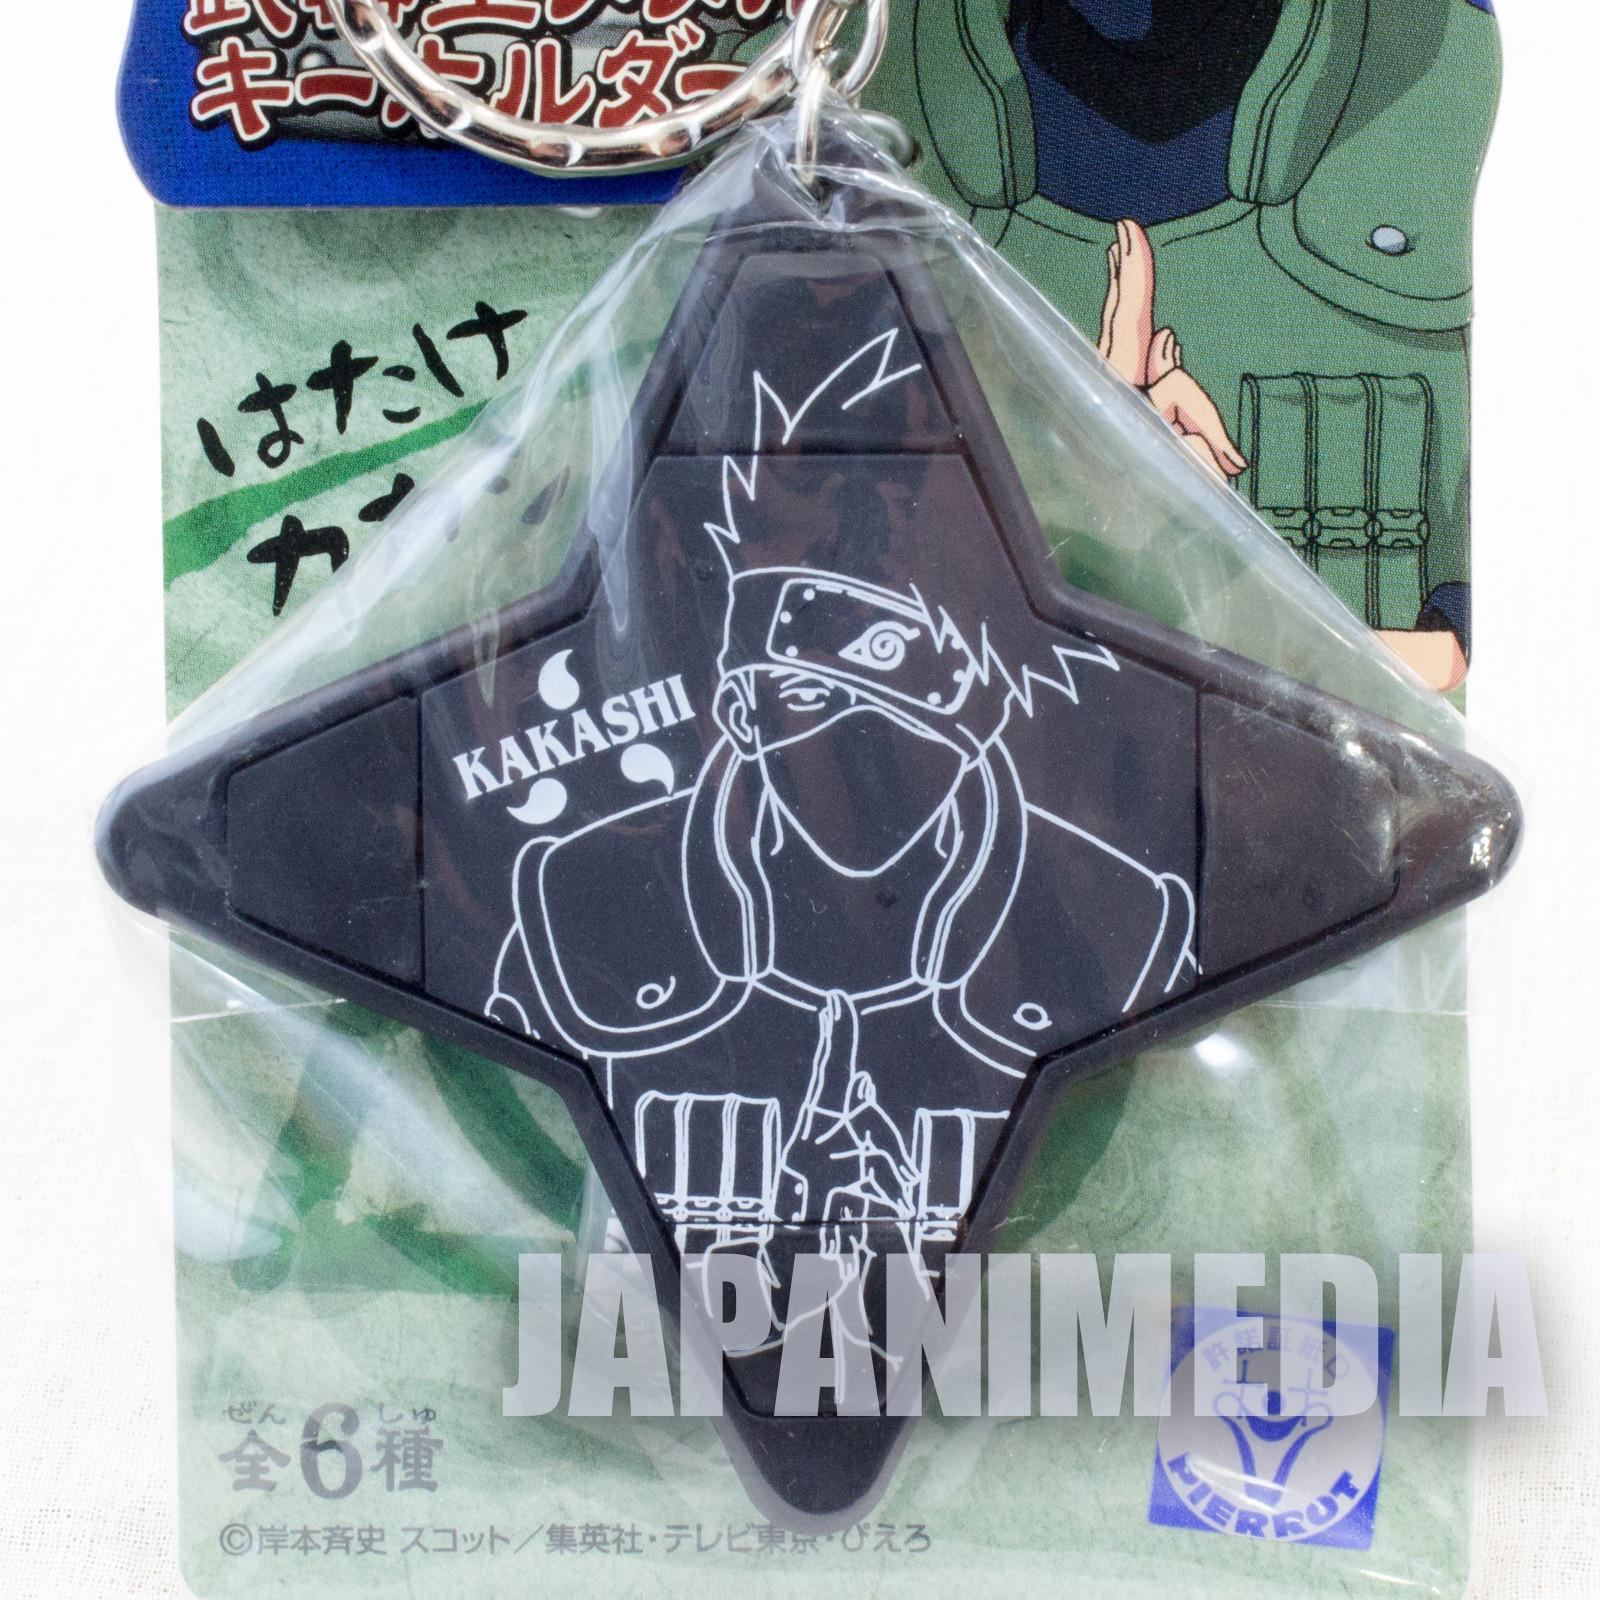 NARUTO Kakashi Hatake Metal Keychain Banpresto JAPAN ANIME MANGA JUMP